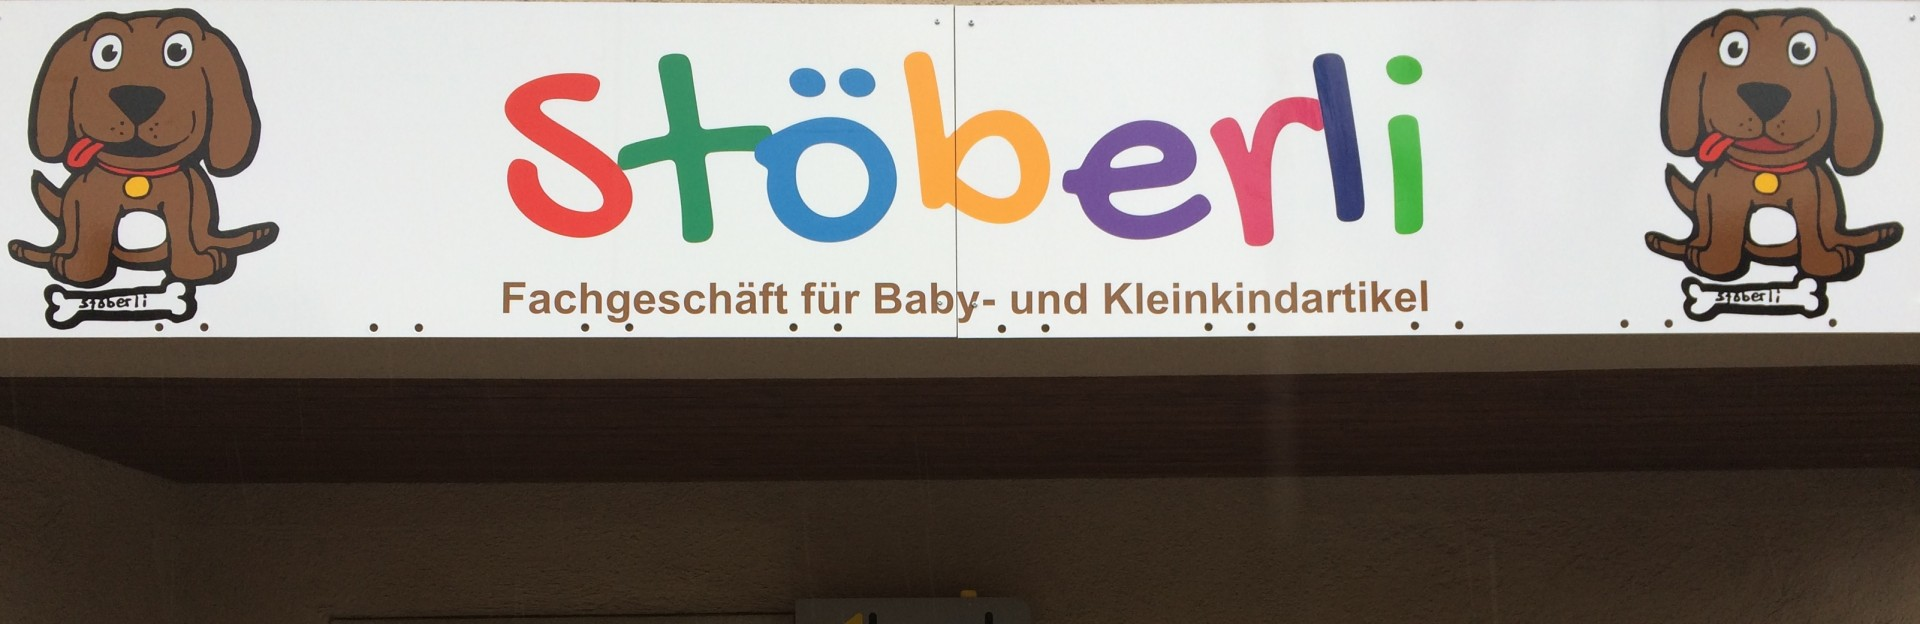 Banner-Stöberli